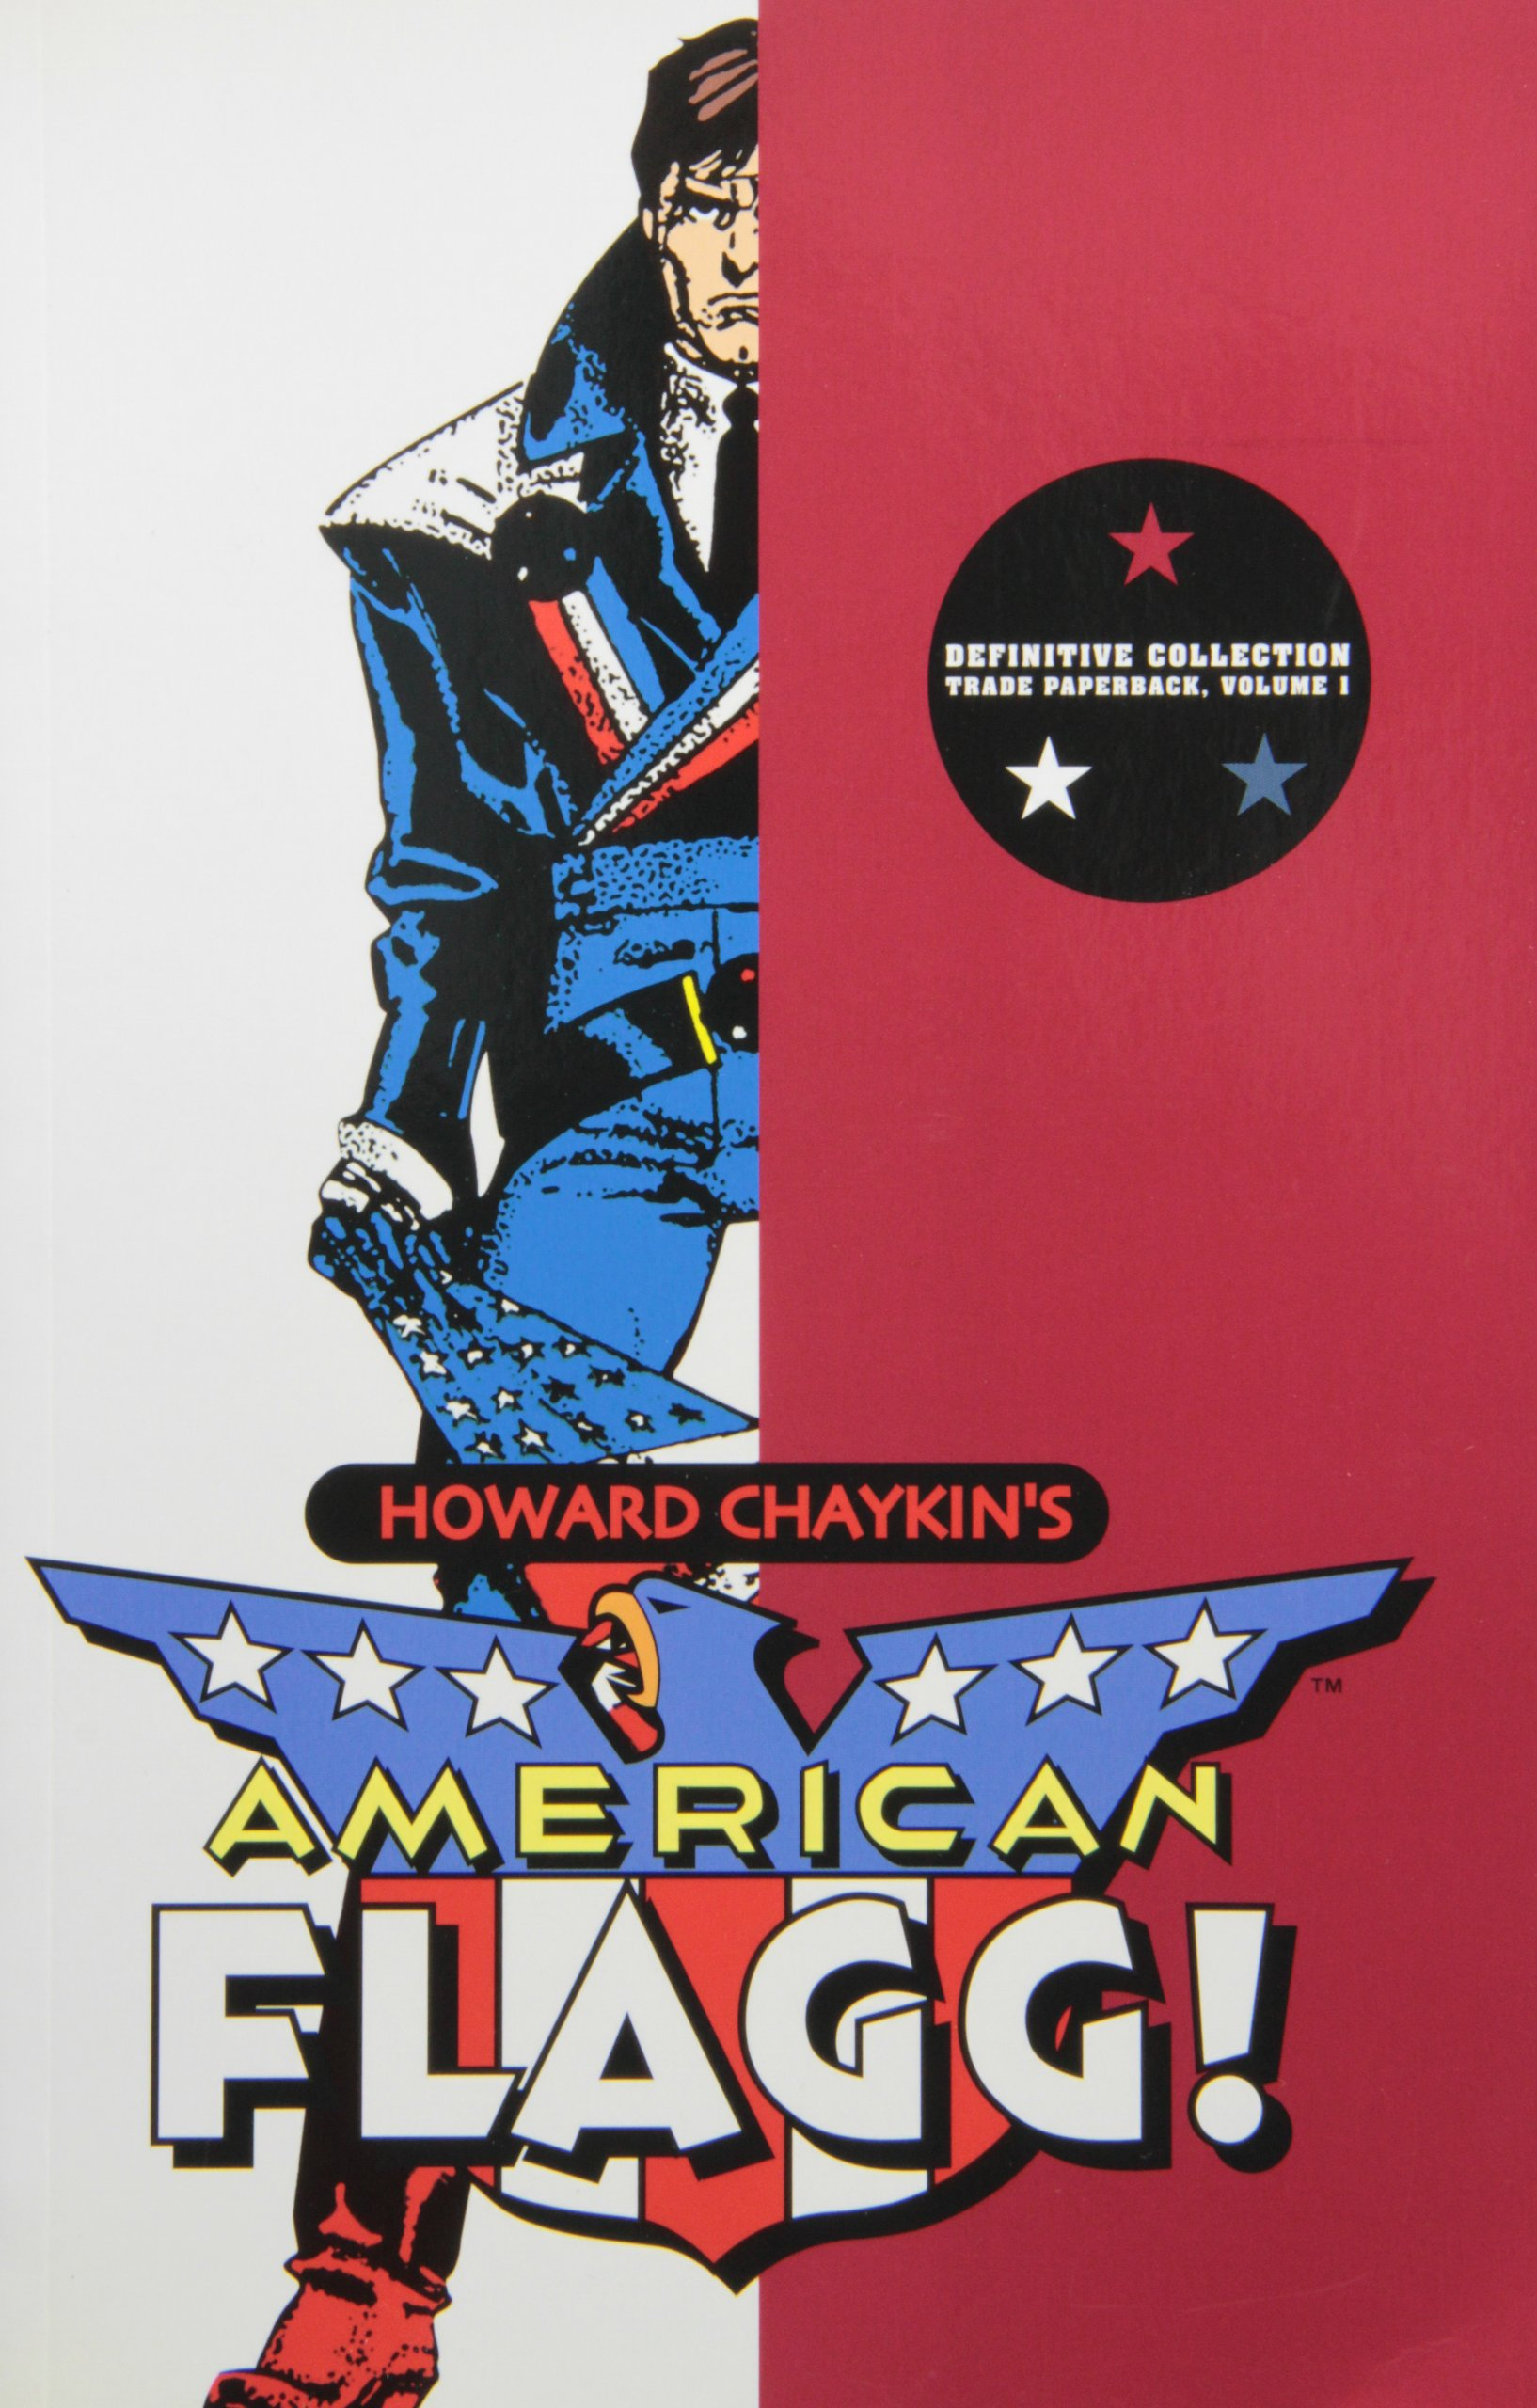 American Flagg! Volume 1